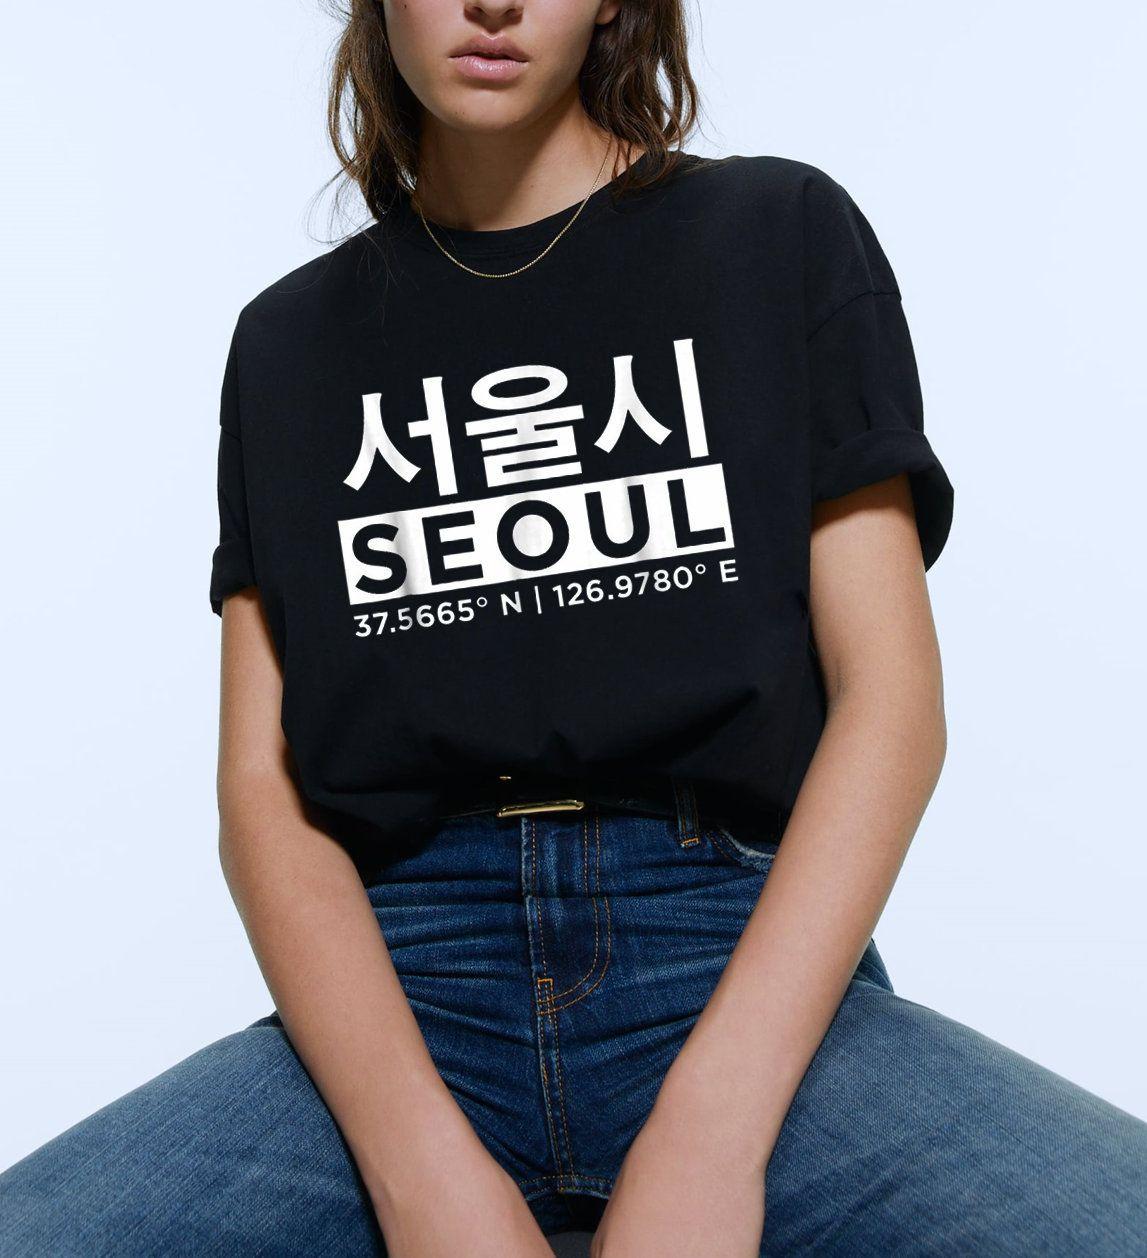 Seoul Korea Tshirt,Seoul Handwritten t-shirt, Seoul Korea Shirt